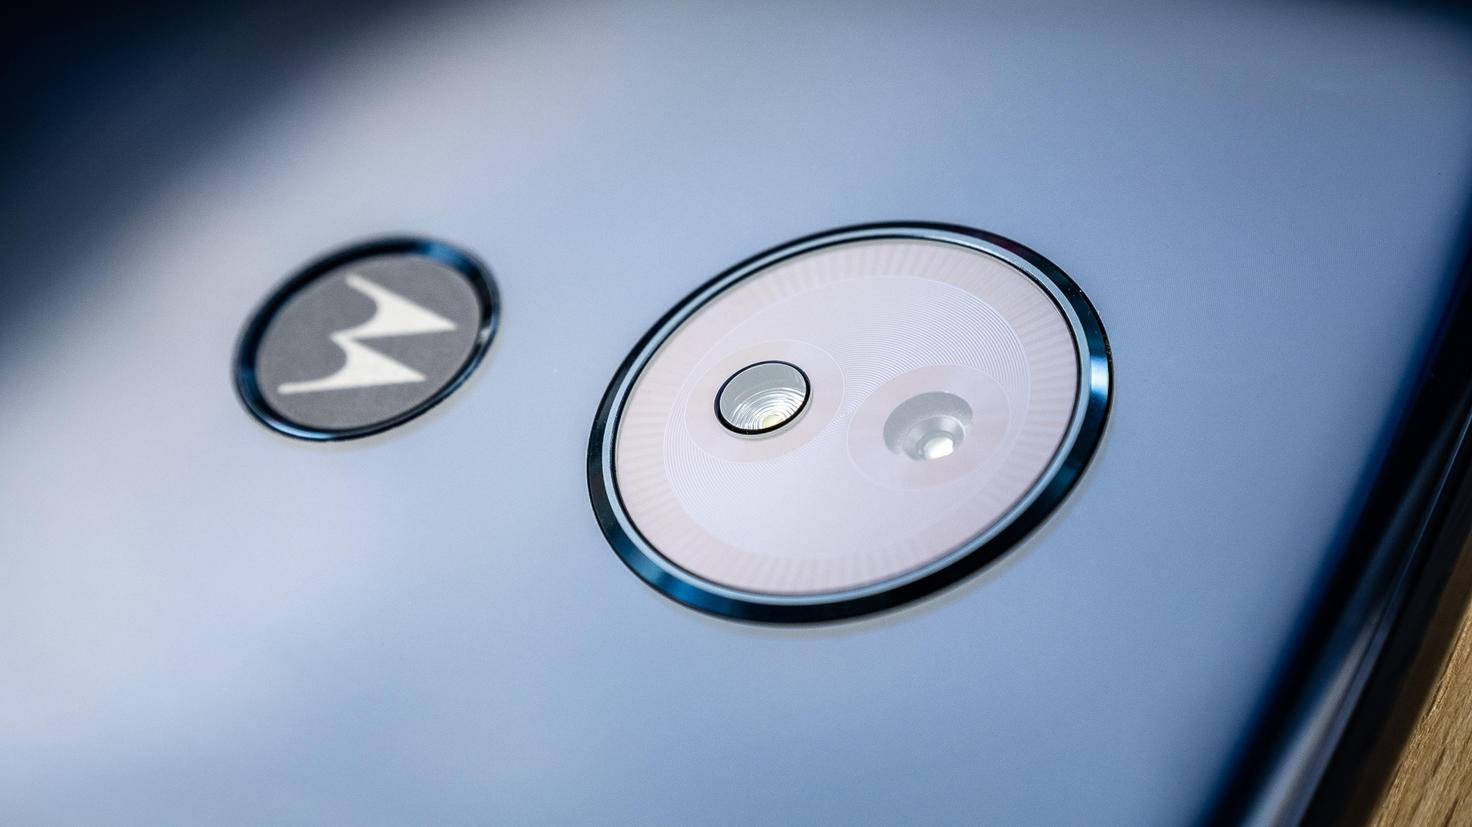 Motorola-Moto-G6-Play-TURN-ON-2